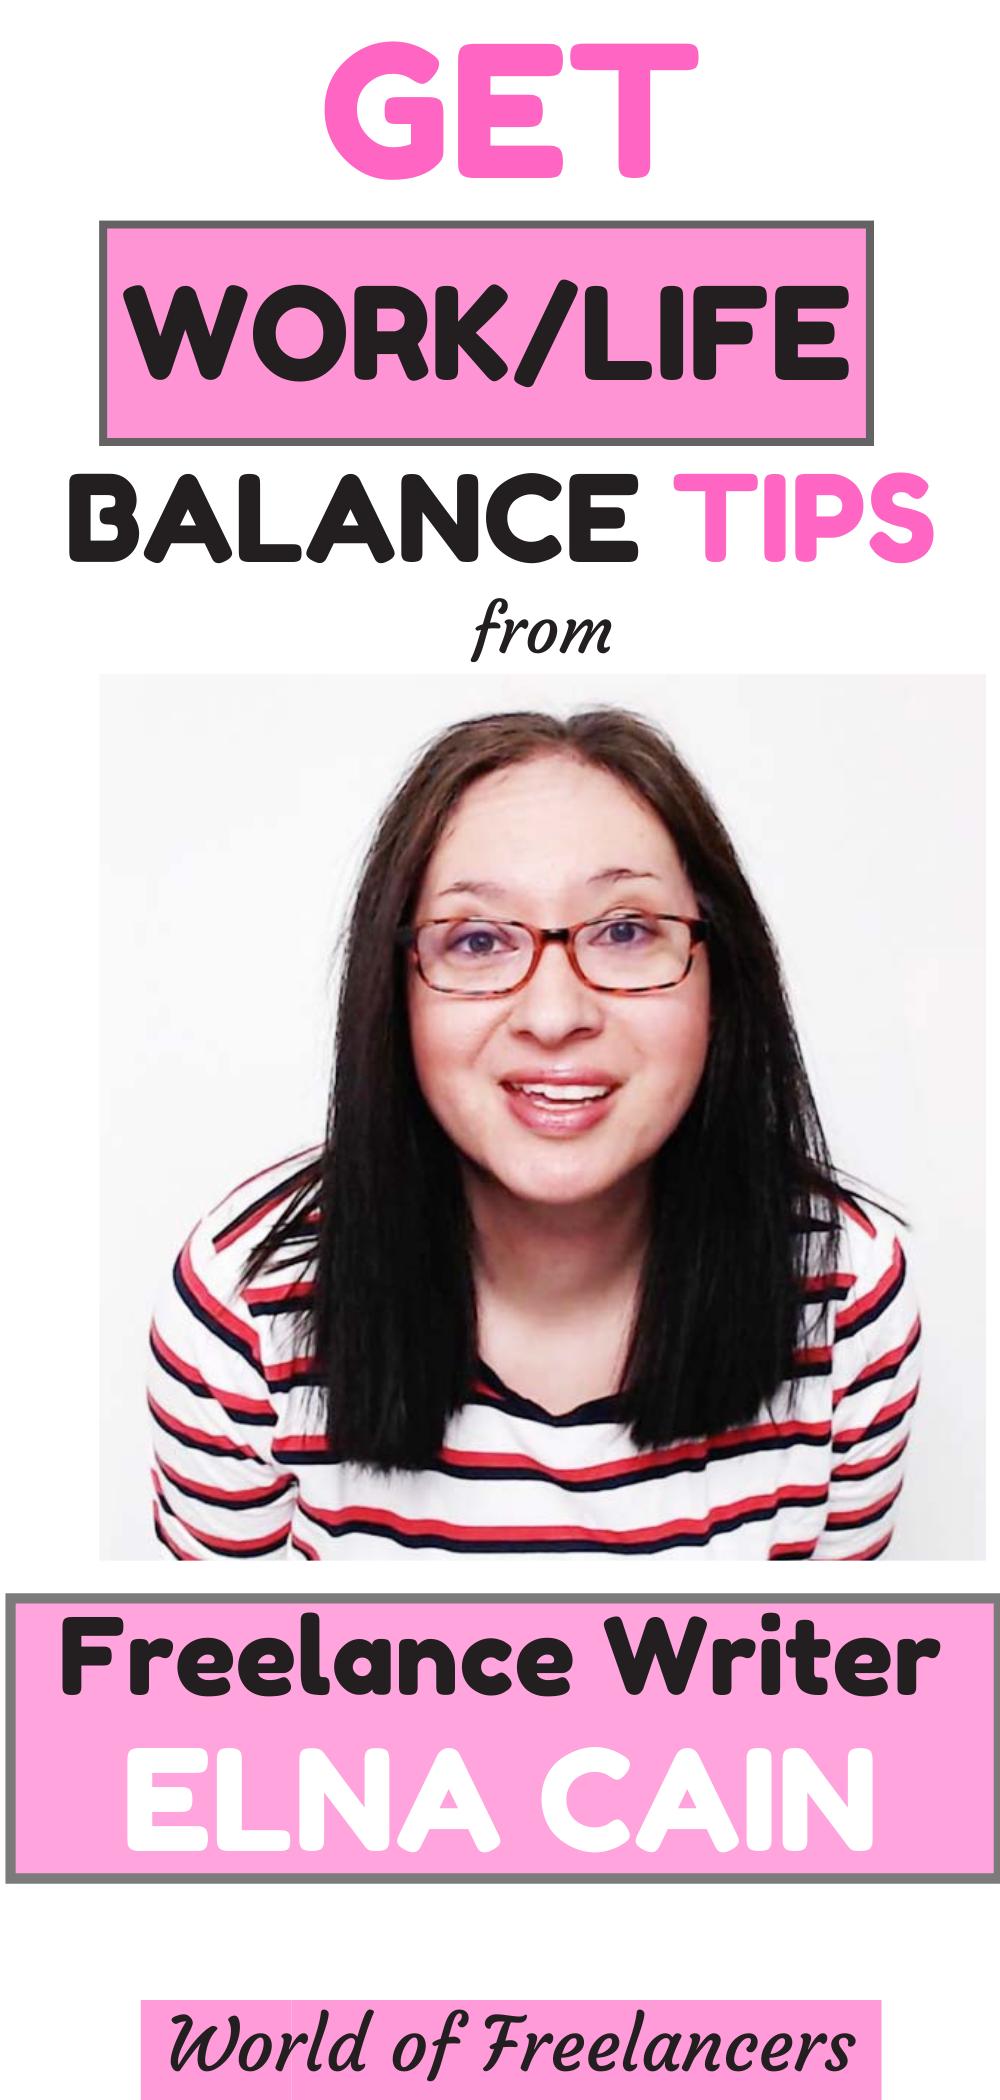 Get work/life balance tips from freelance Writer Elna Cain